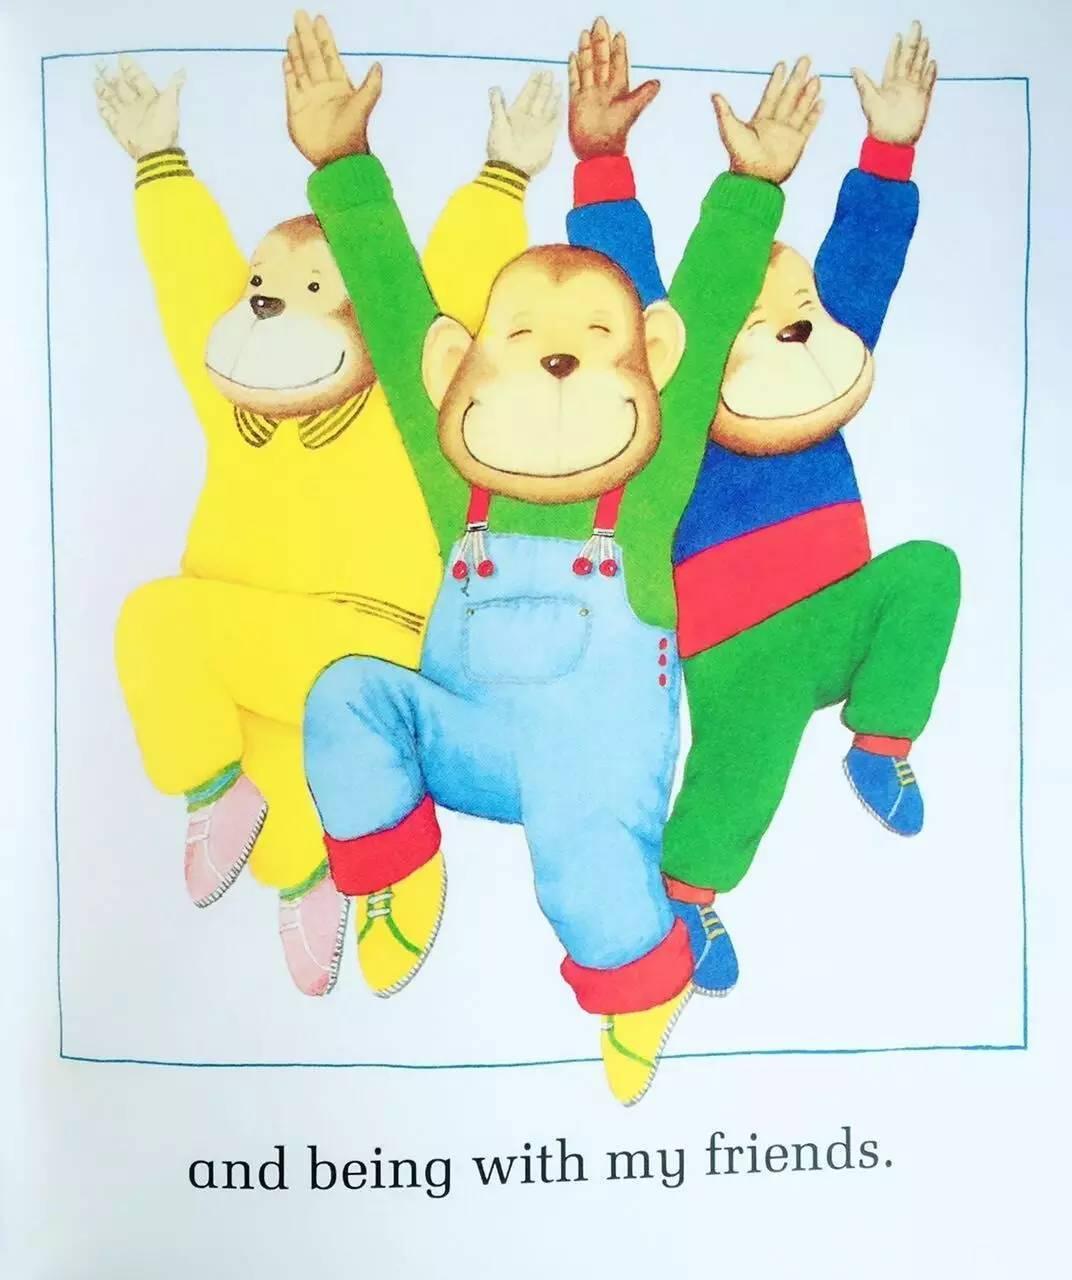 Things I Like 我喜欢的一切 -第16张图片-58绘本网-专注儿童绘本批发销售。